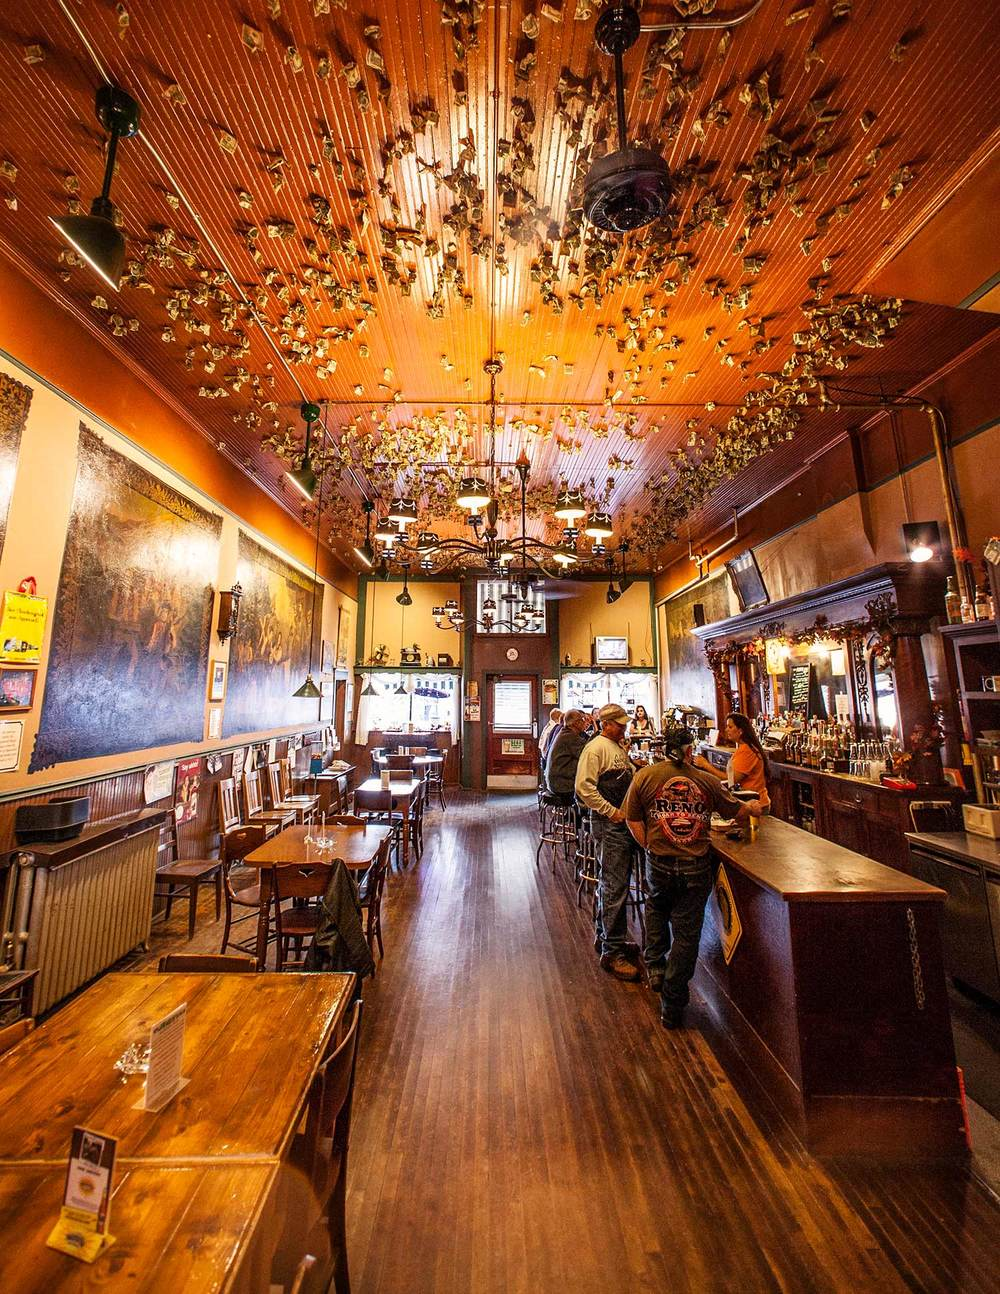 Peumpel's Tavern